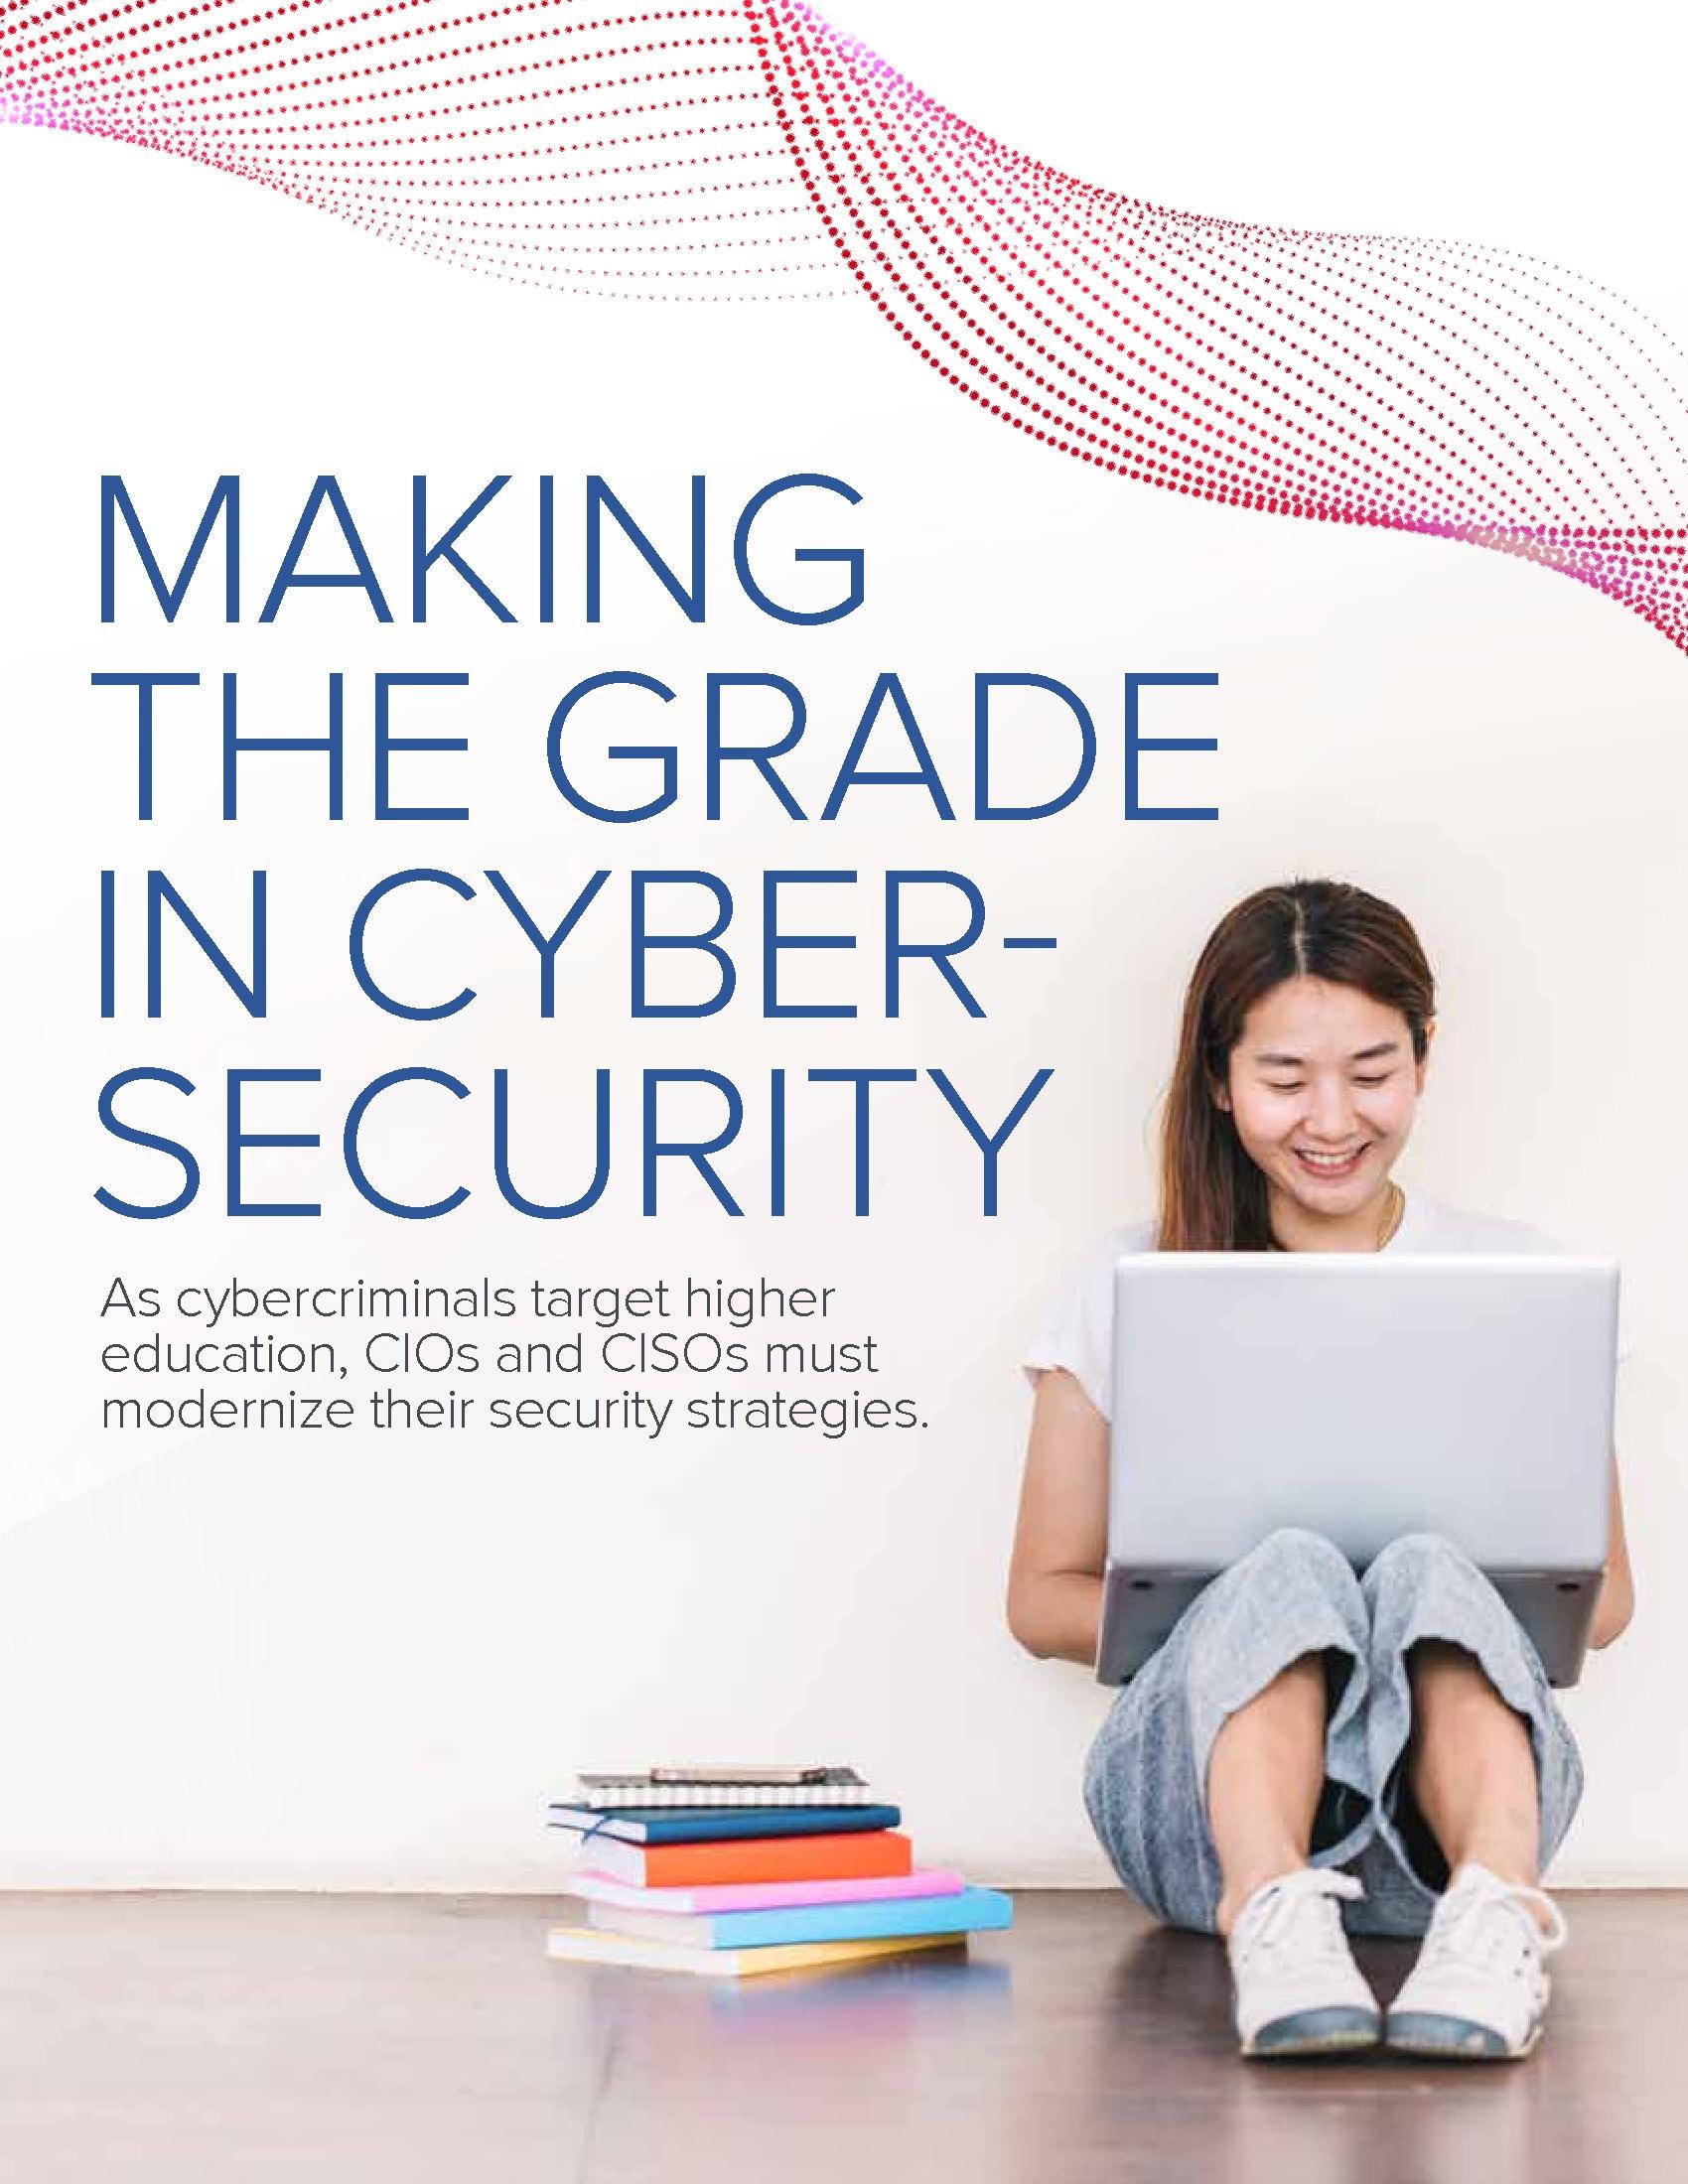 CDE - FireEye - TLP - 190326 - Making the Grade in Cybersecurity